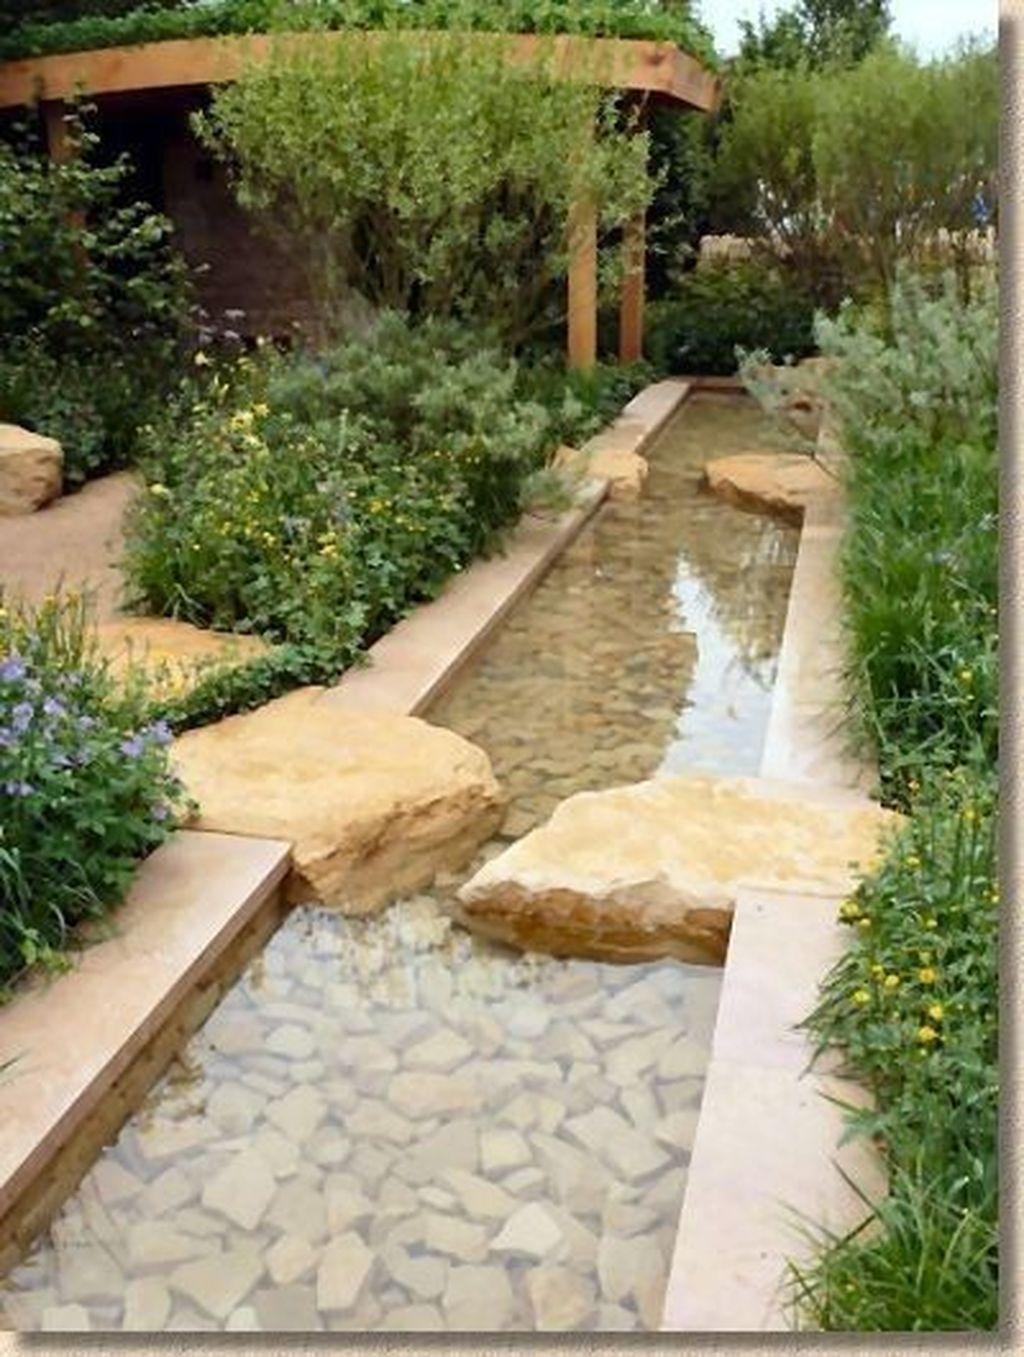 45 Splendid Backyard Ponds Water Garden Landscaping Ideas ... on Courtyard Pond Ideas id=93857